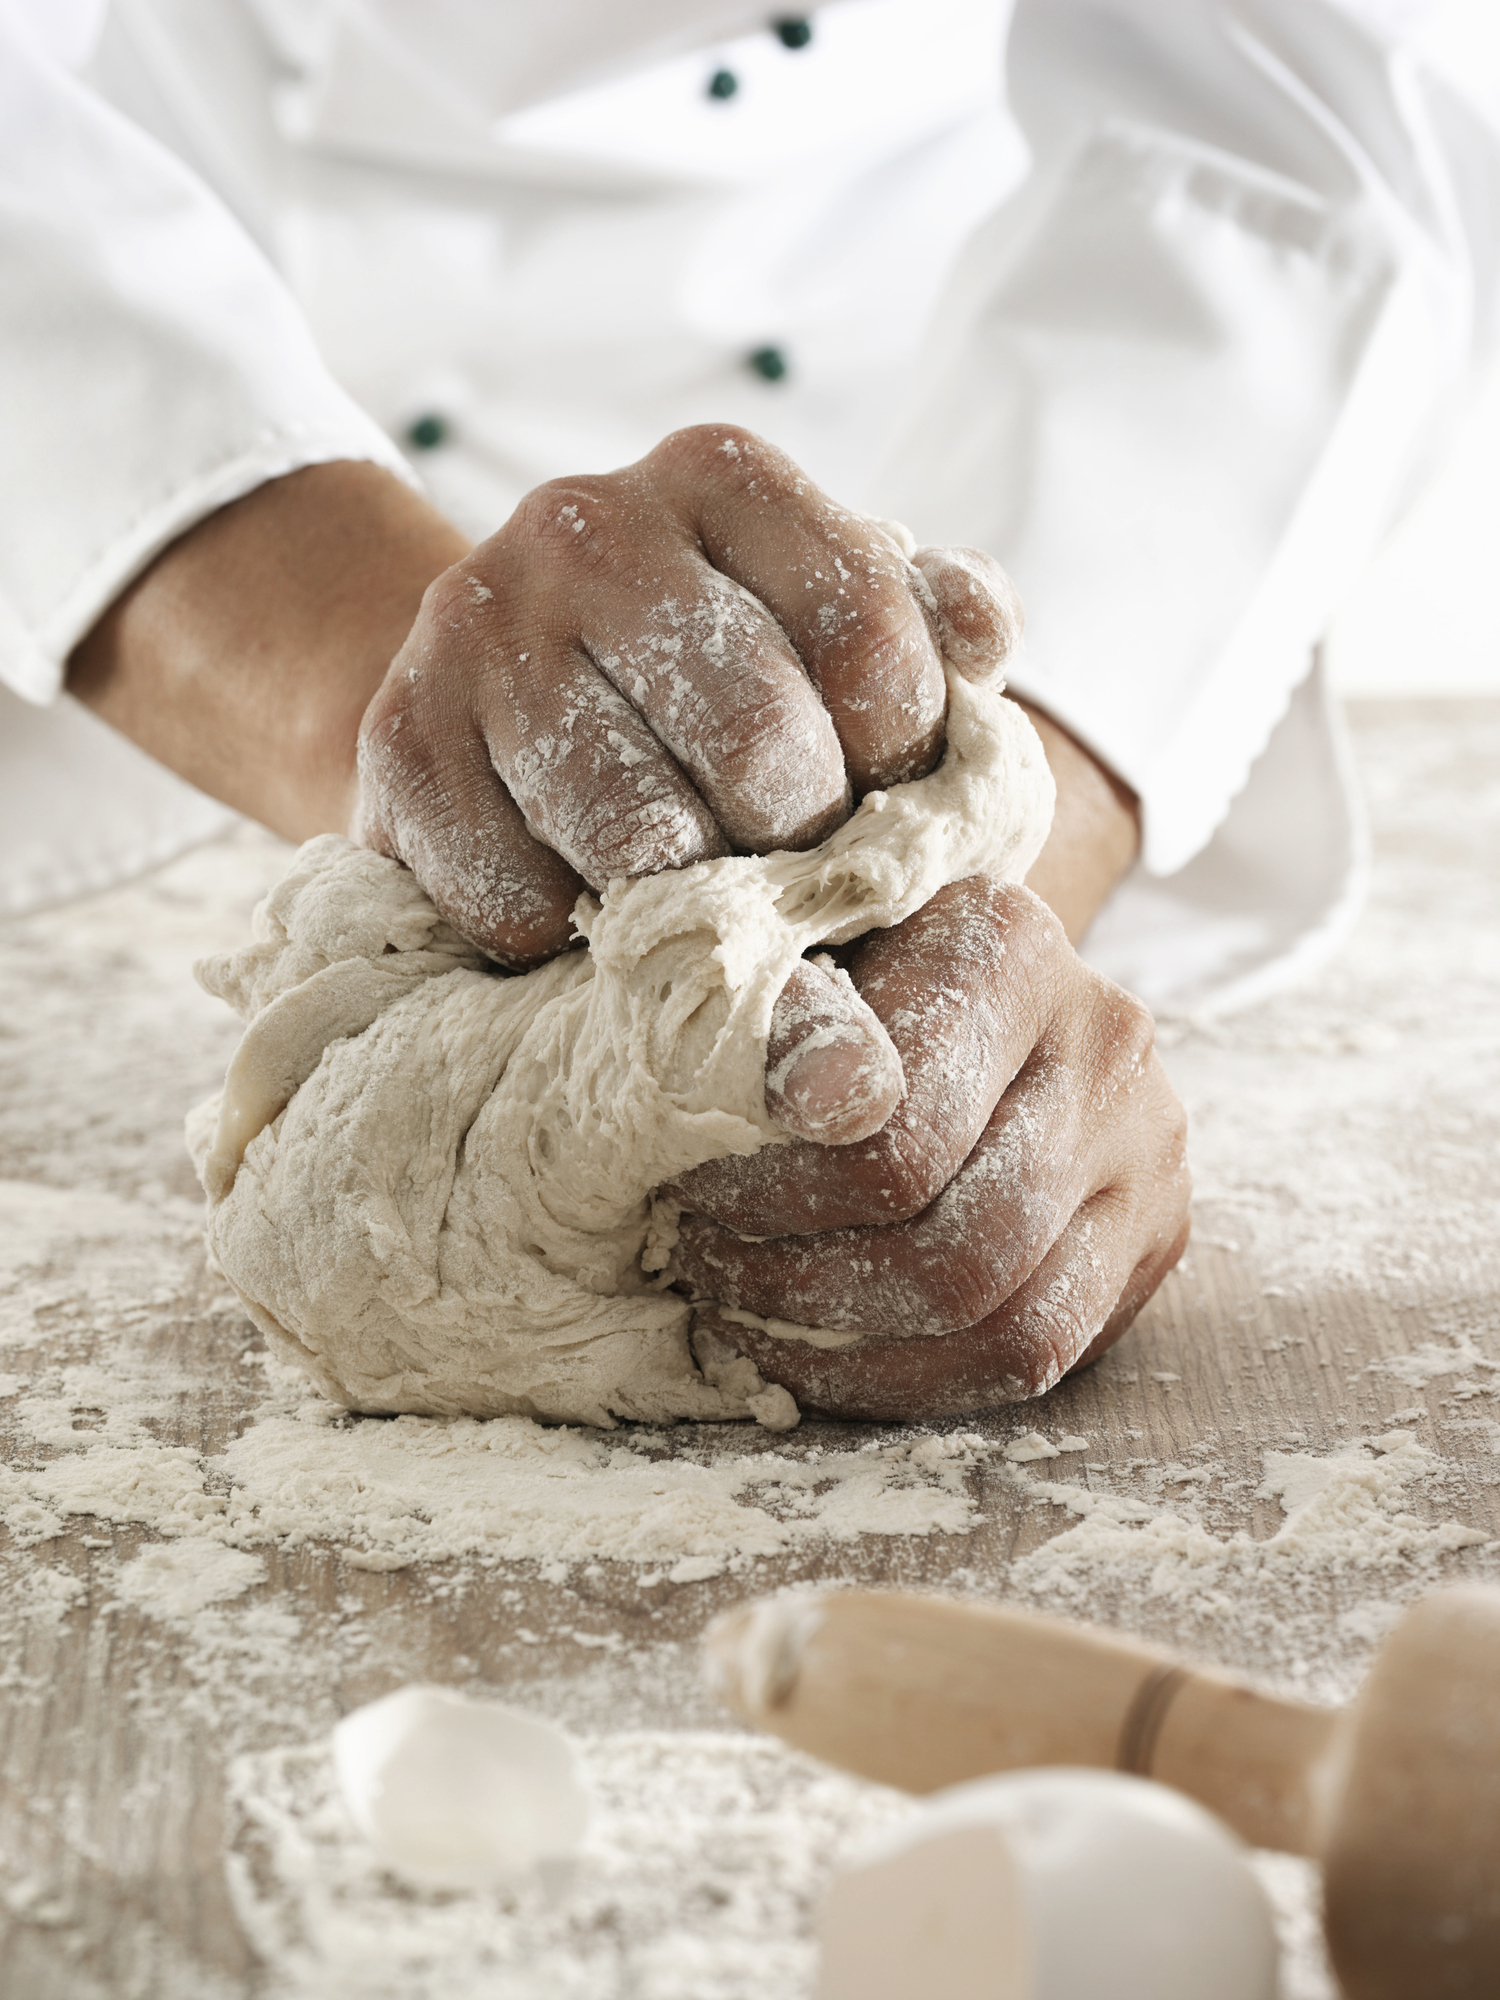 istock kneading dough